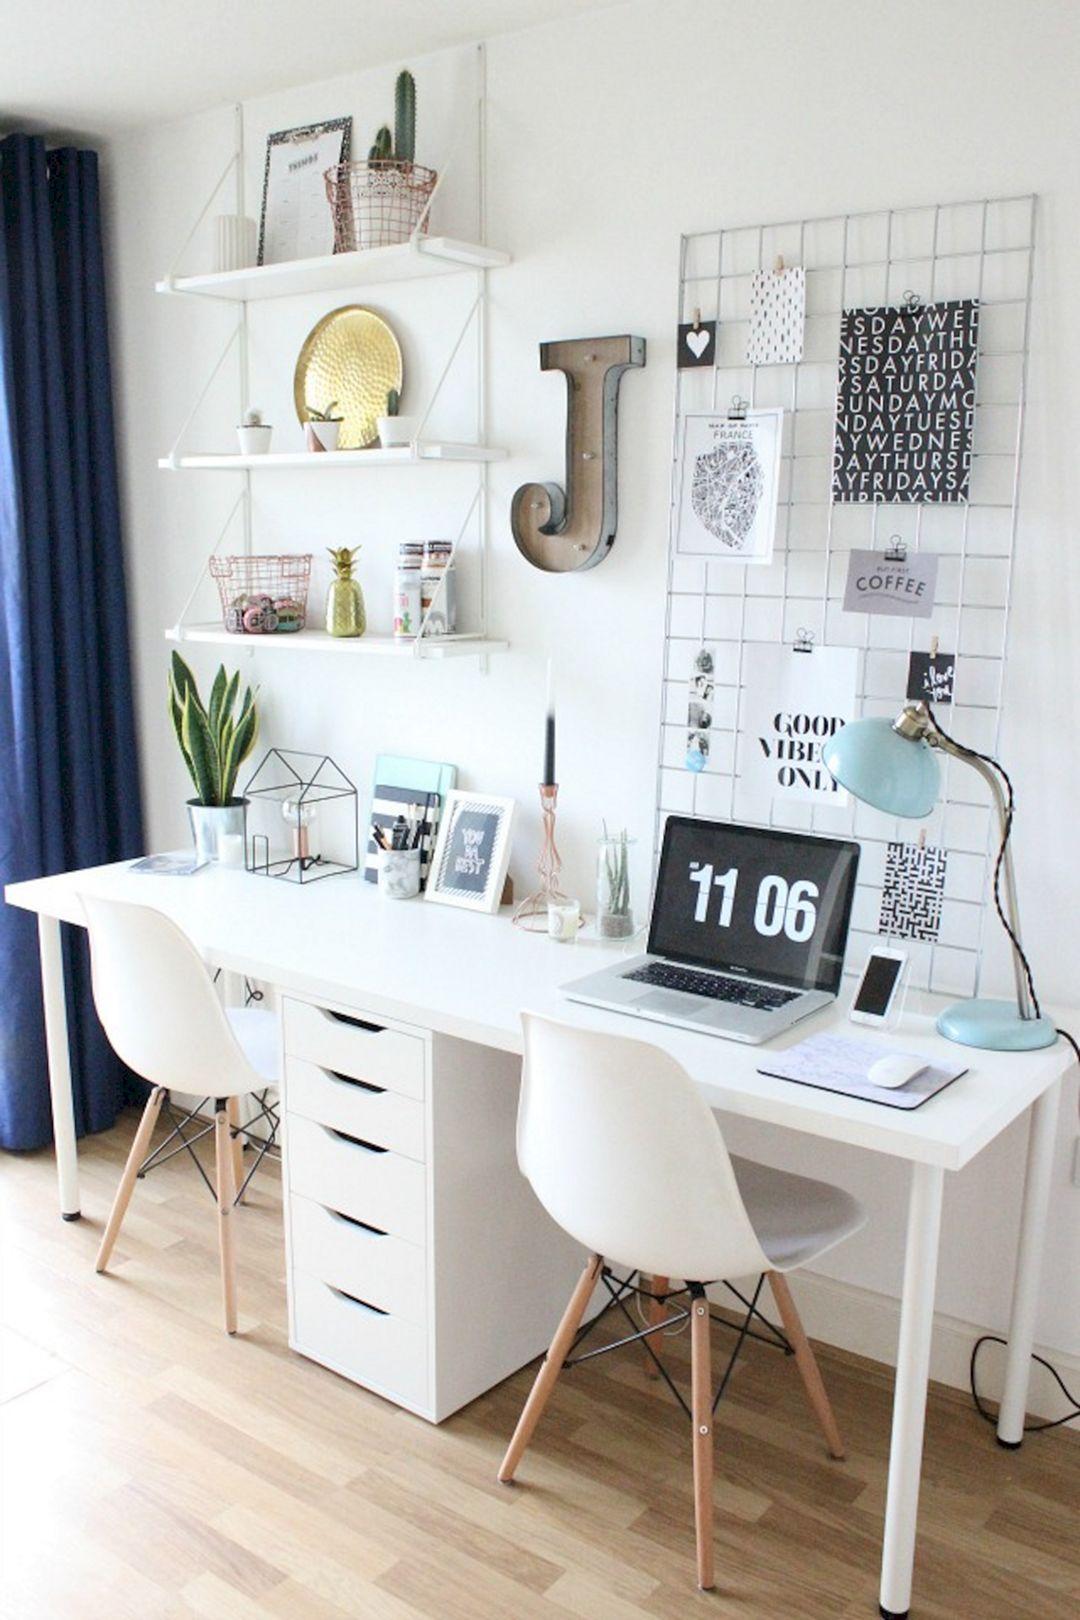 Study Room Layout: Small Study Room Design Ideas 3 (Small Study Room Design